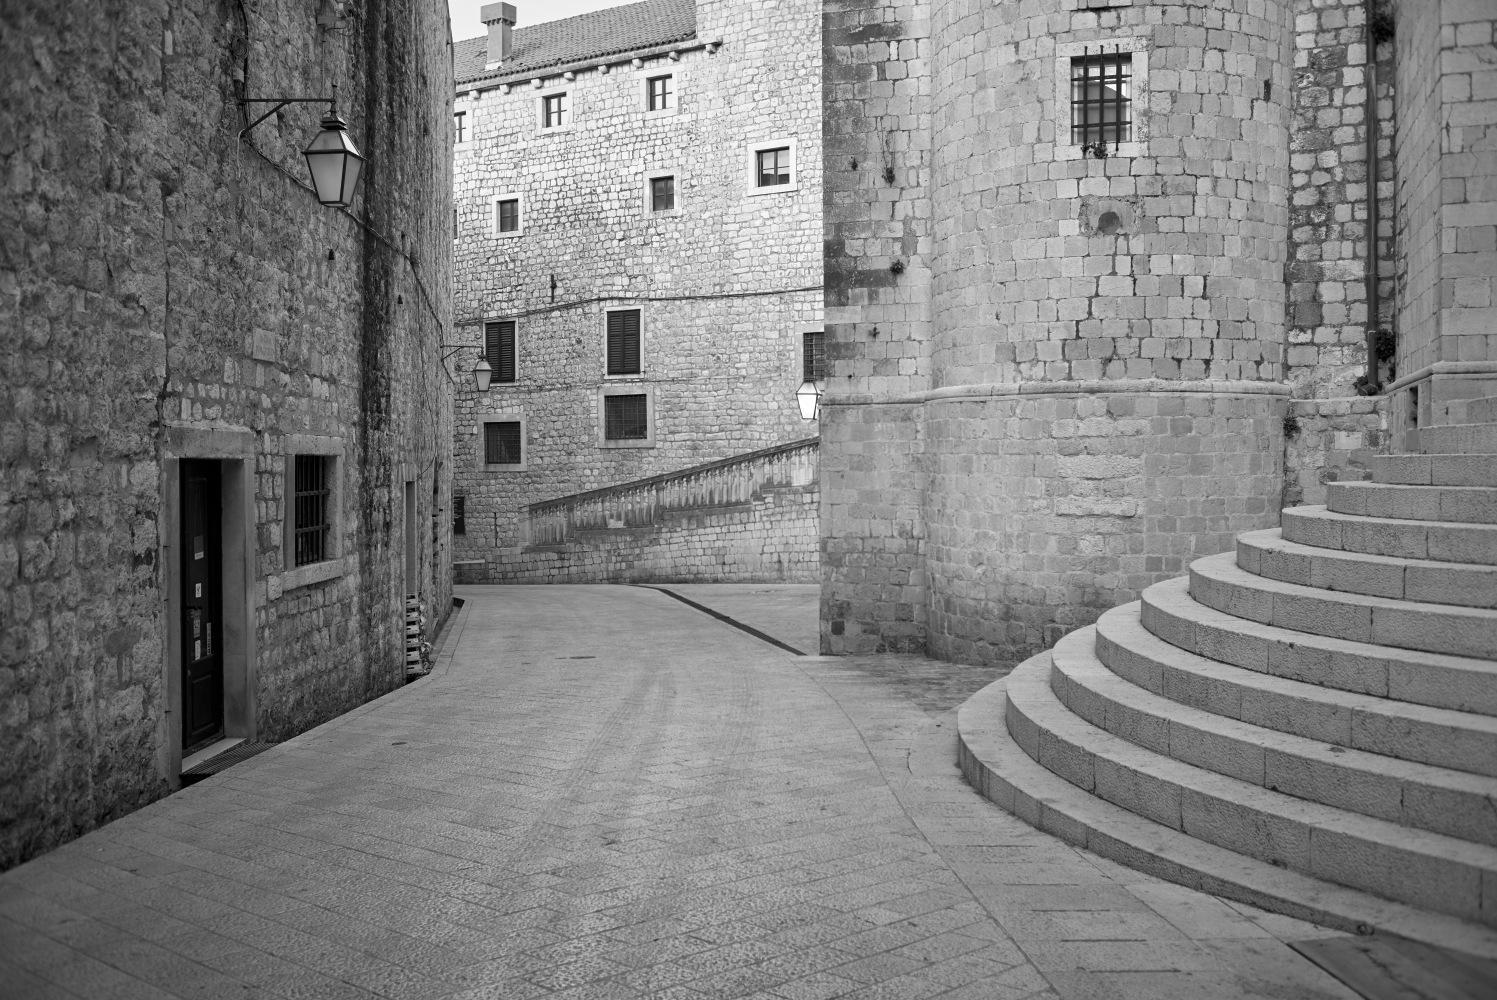 Streets of Dubrovnik by Filip Molcan